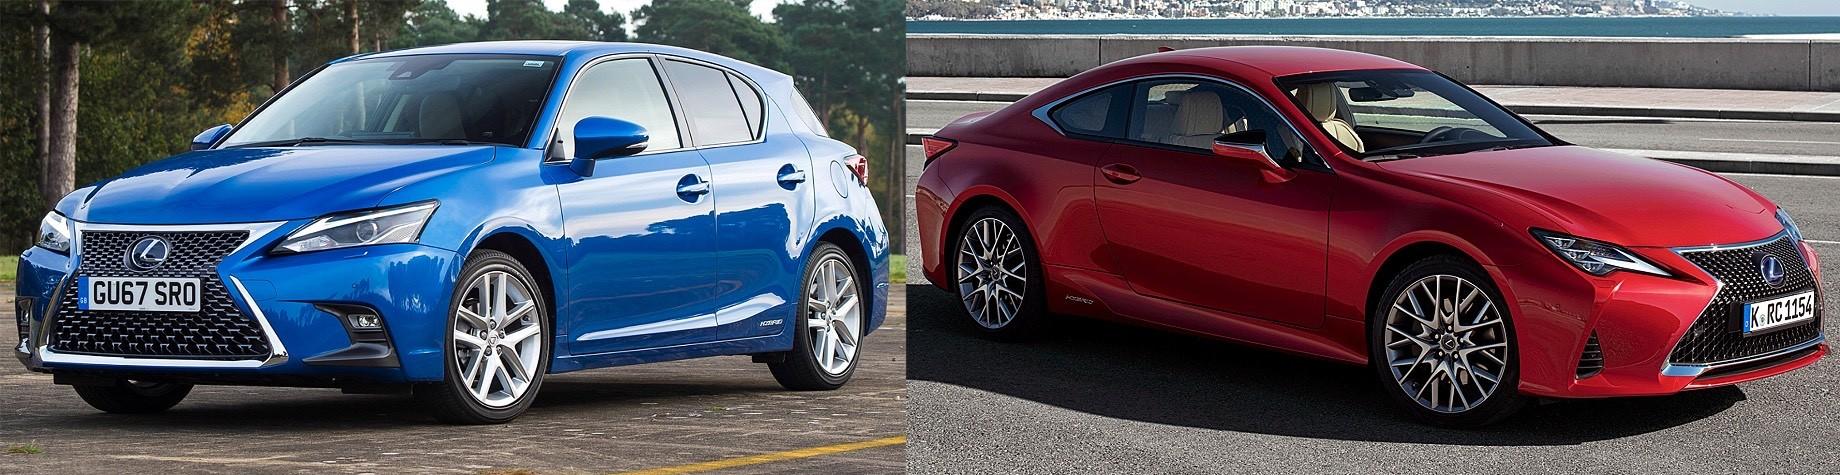 Lexus скоротить модельний ряд на європейському ринку